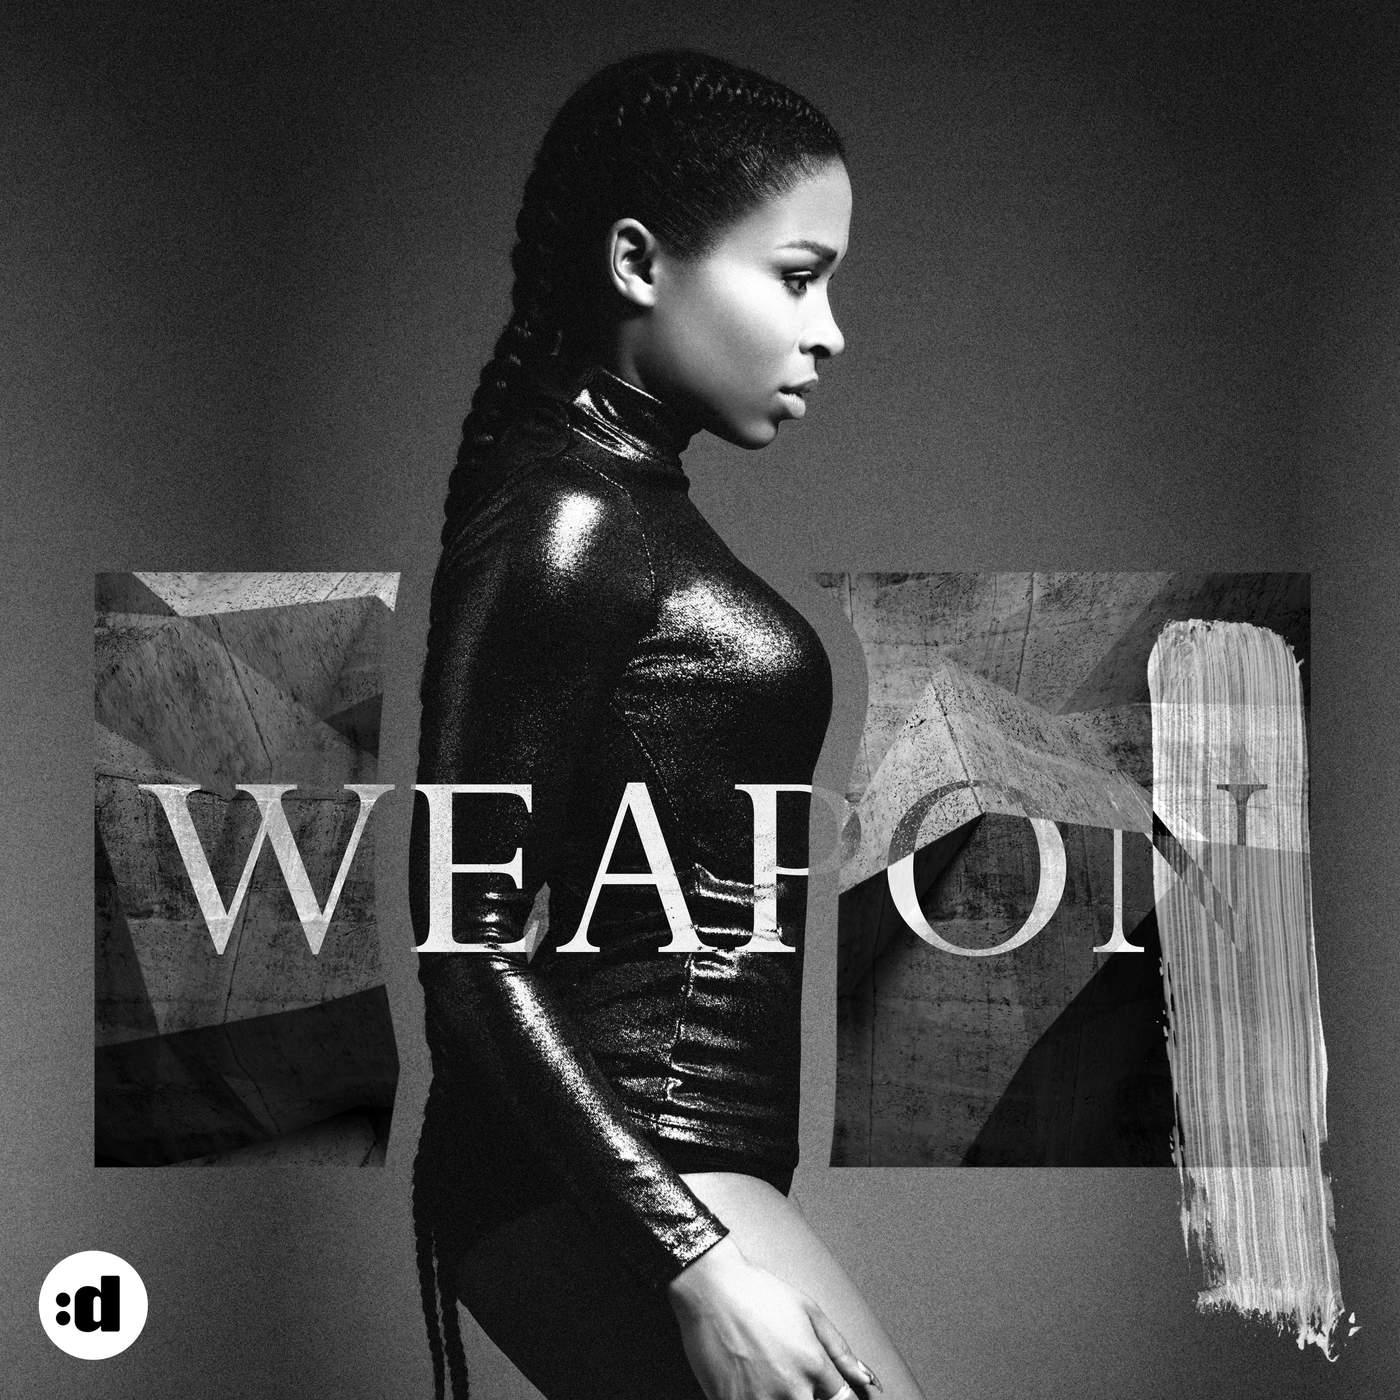 Weapon - EP.jpg